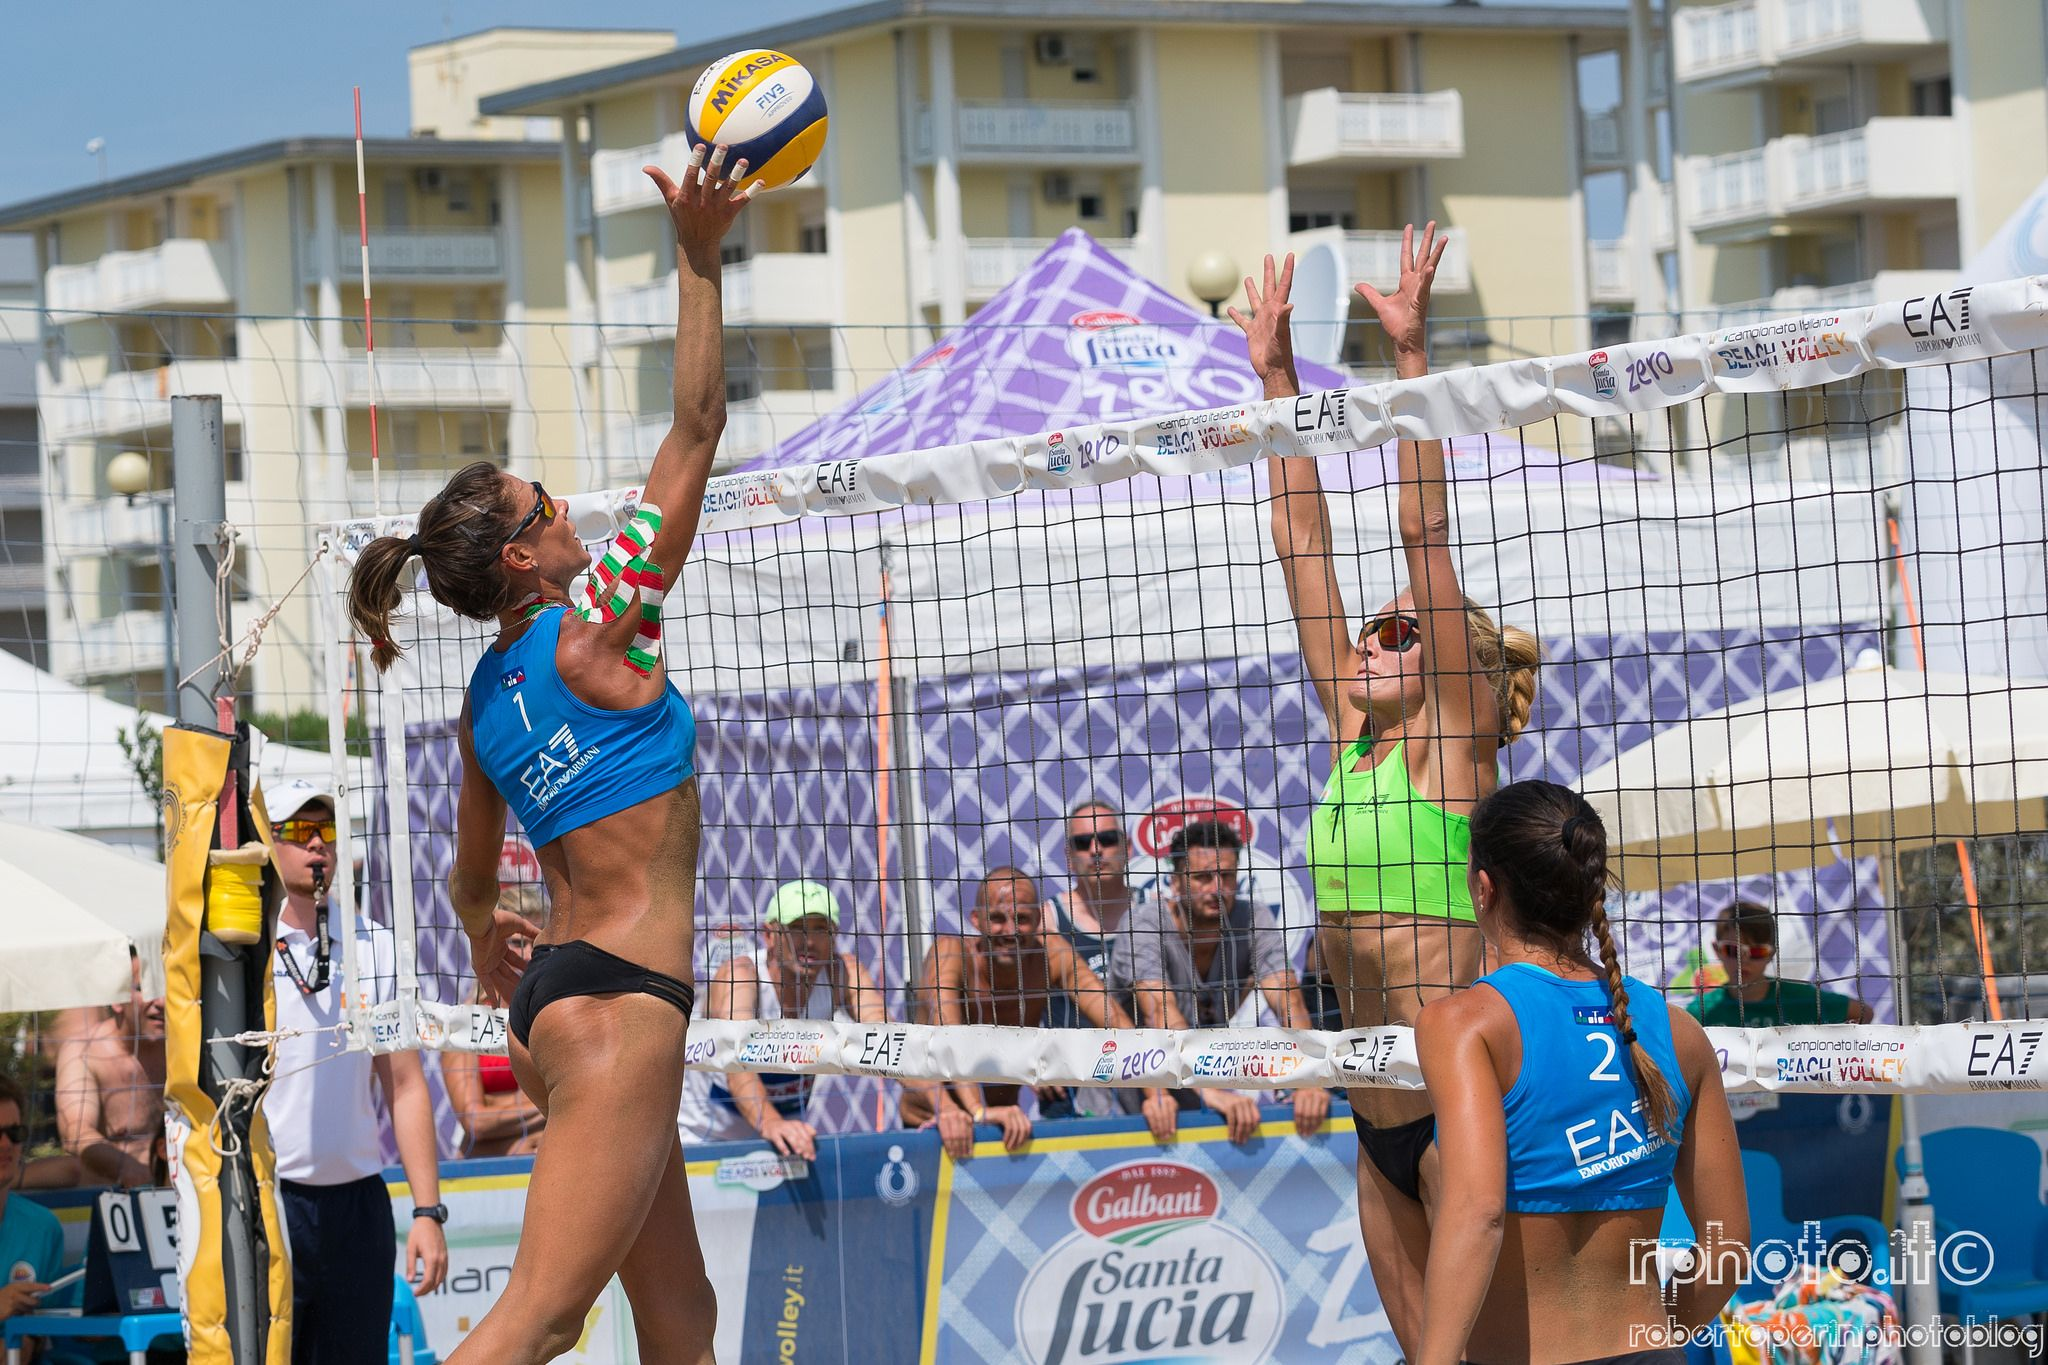 2 Tappa Campionato Italiano Beach Volley Beach Volleyball Volley Beach Girls